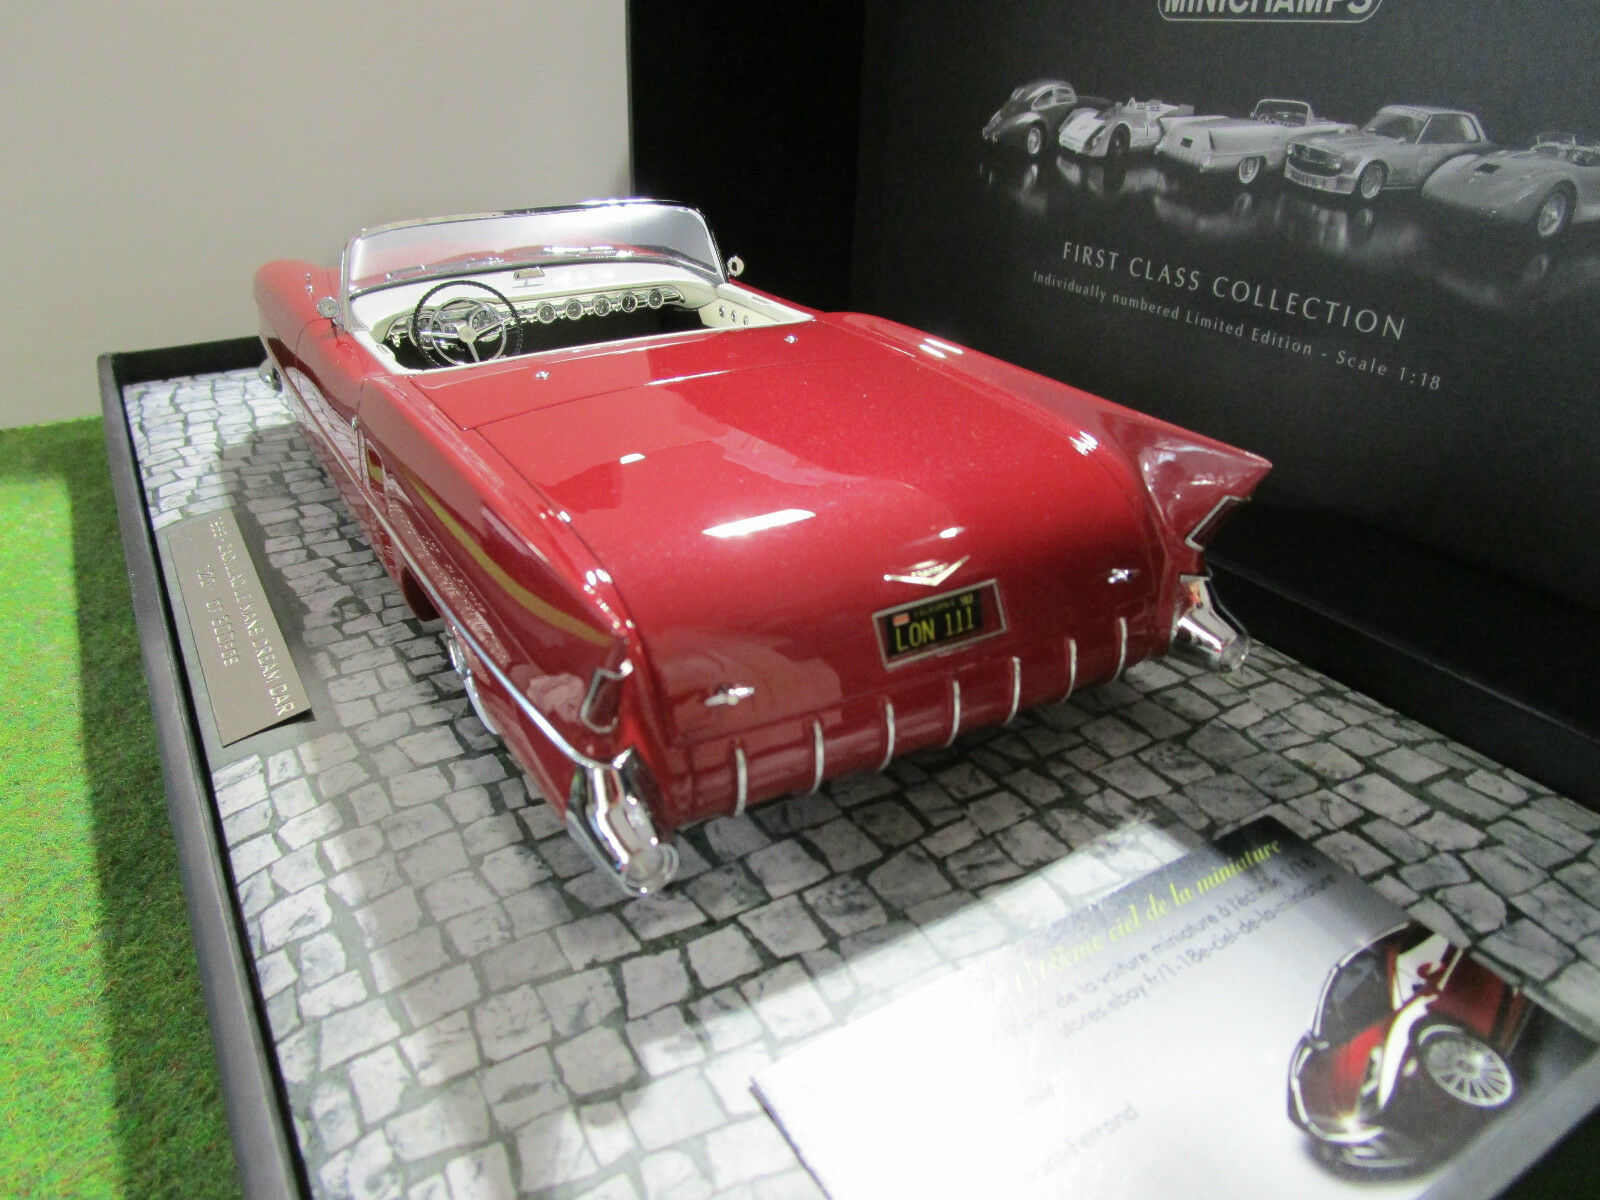 CADILLAC LE uomoS DREAM CAR 1953 Cabriolet Cabriolet Cabriolet rge 1 18 MINICHAMPS 107148231 voiture d6932f